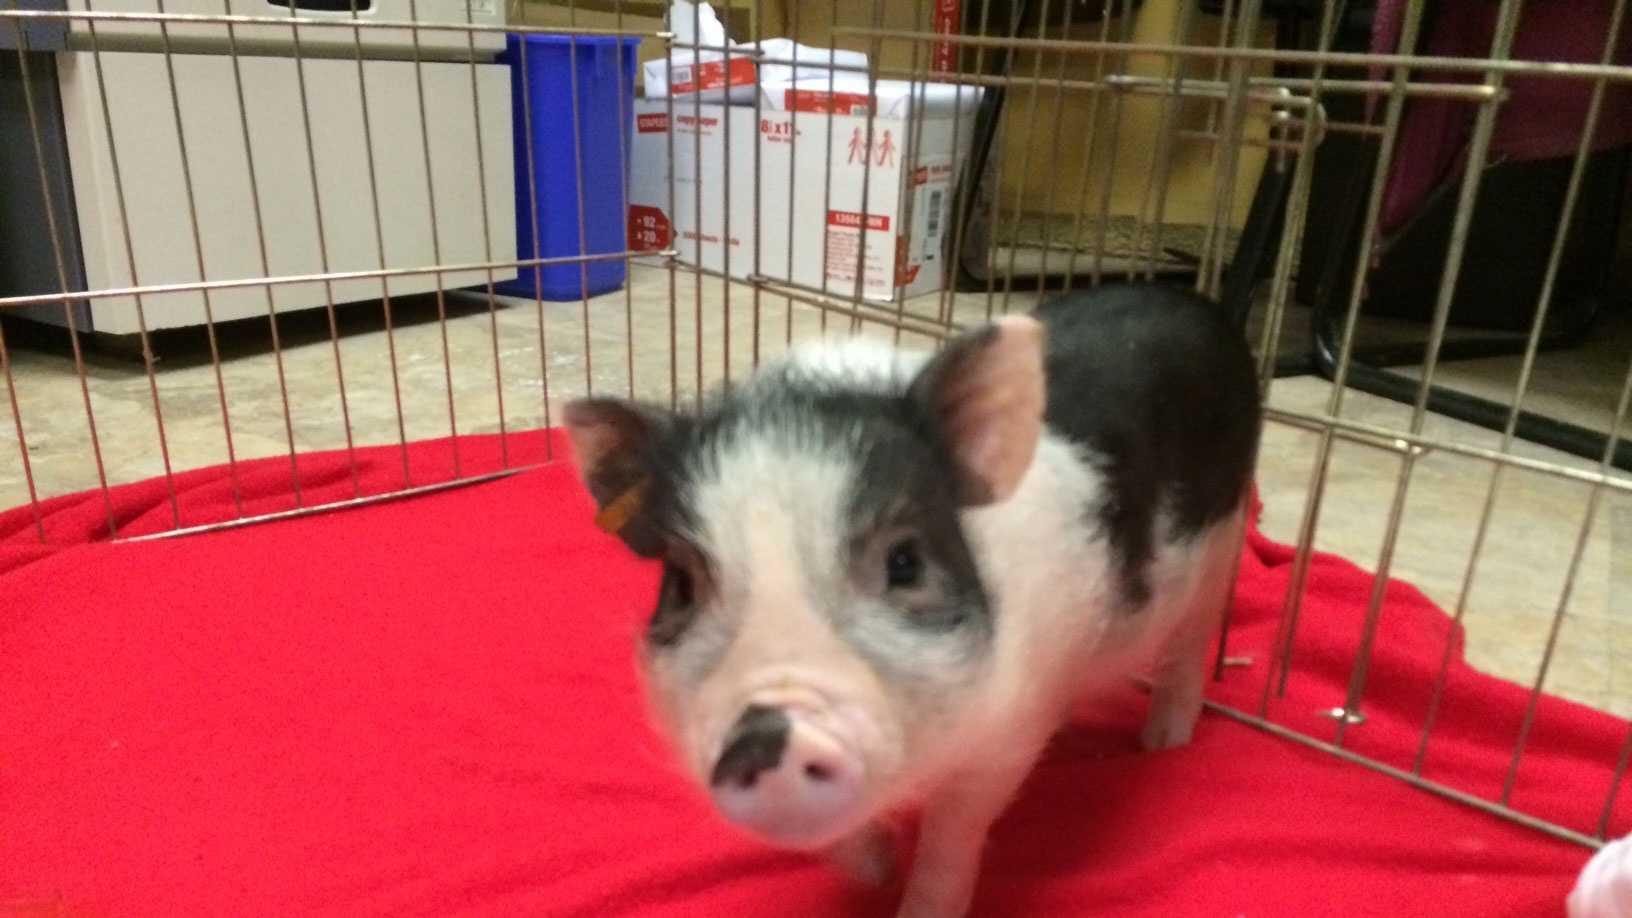 Pig found wandering